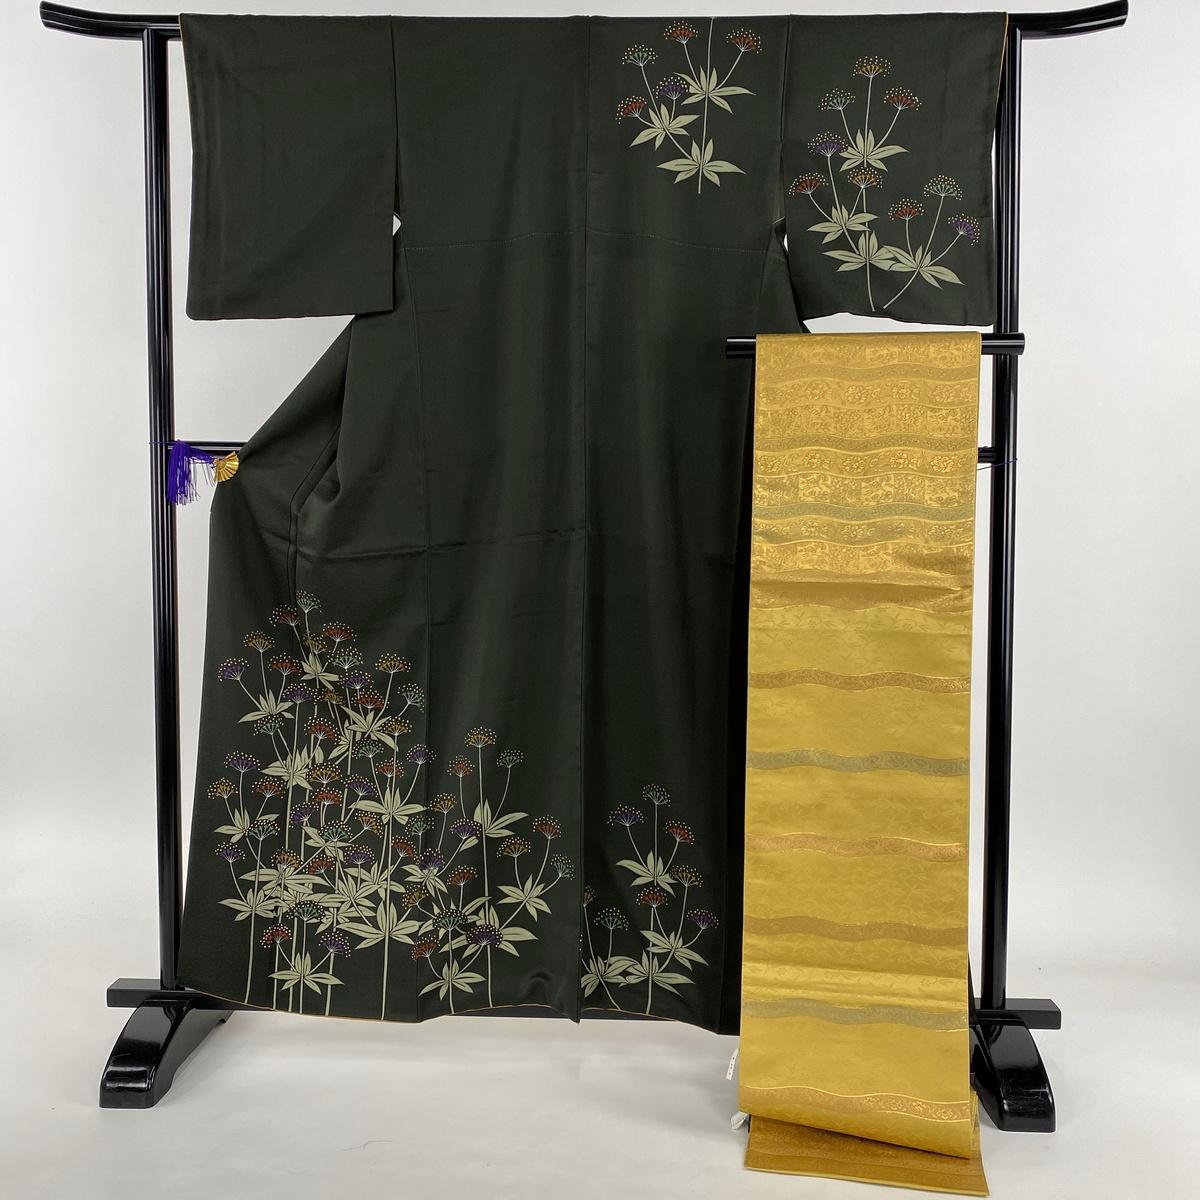 着物セット 美品 秀品 袋帯セット 草花 金彩 深緑 袷 身丈160cm 裄丈63cm S 正絹 【中古】